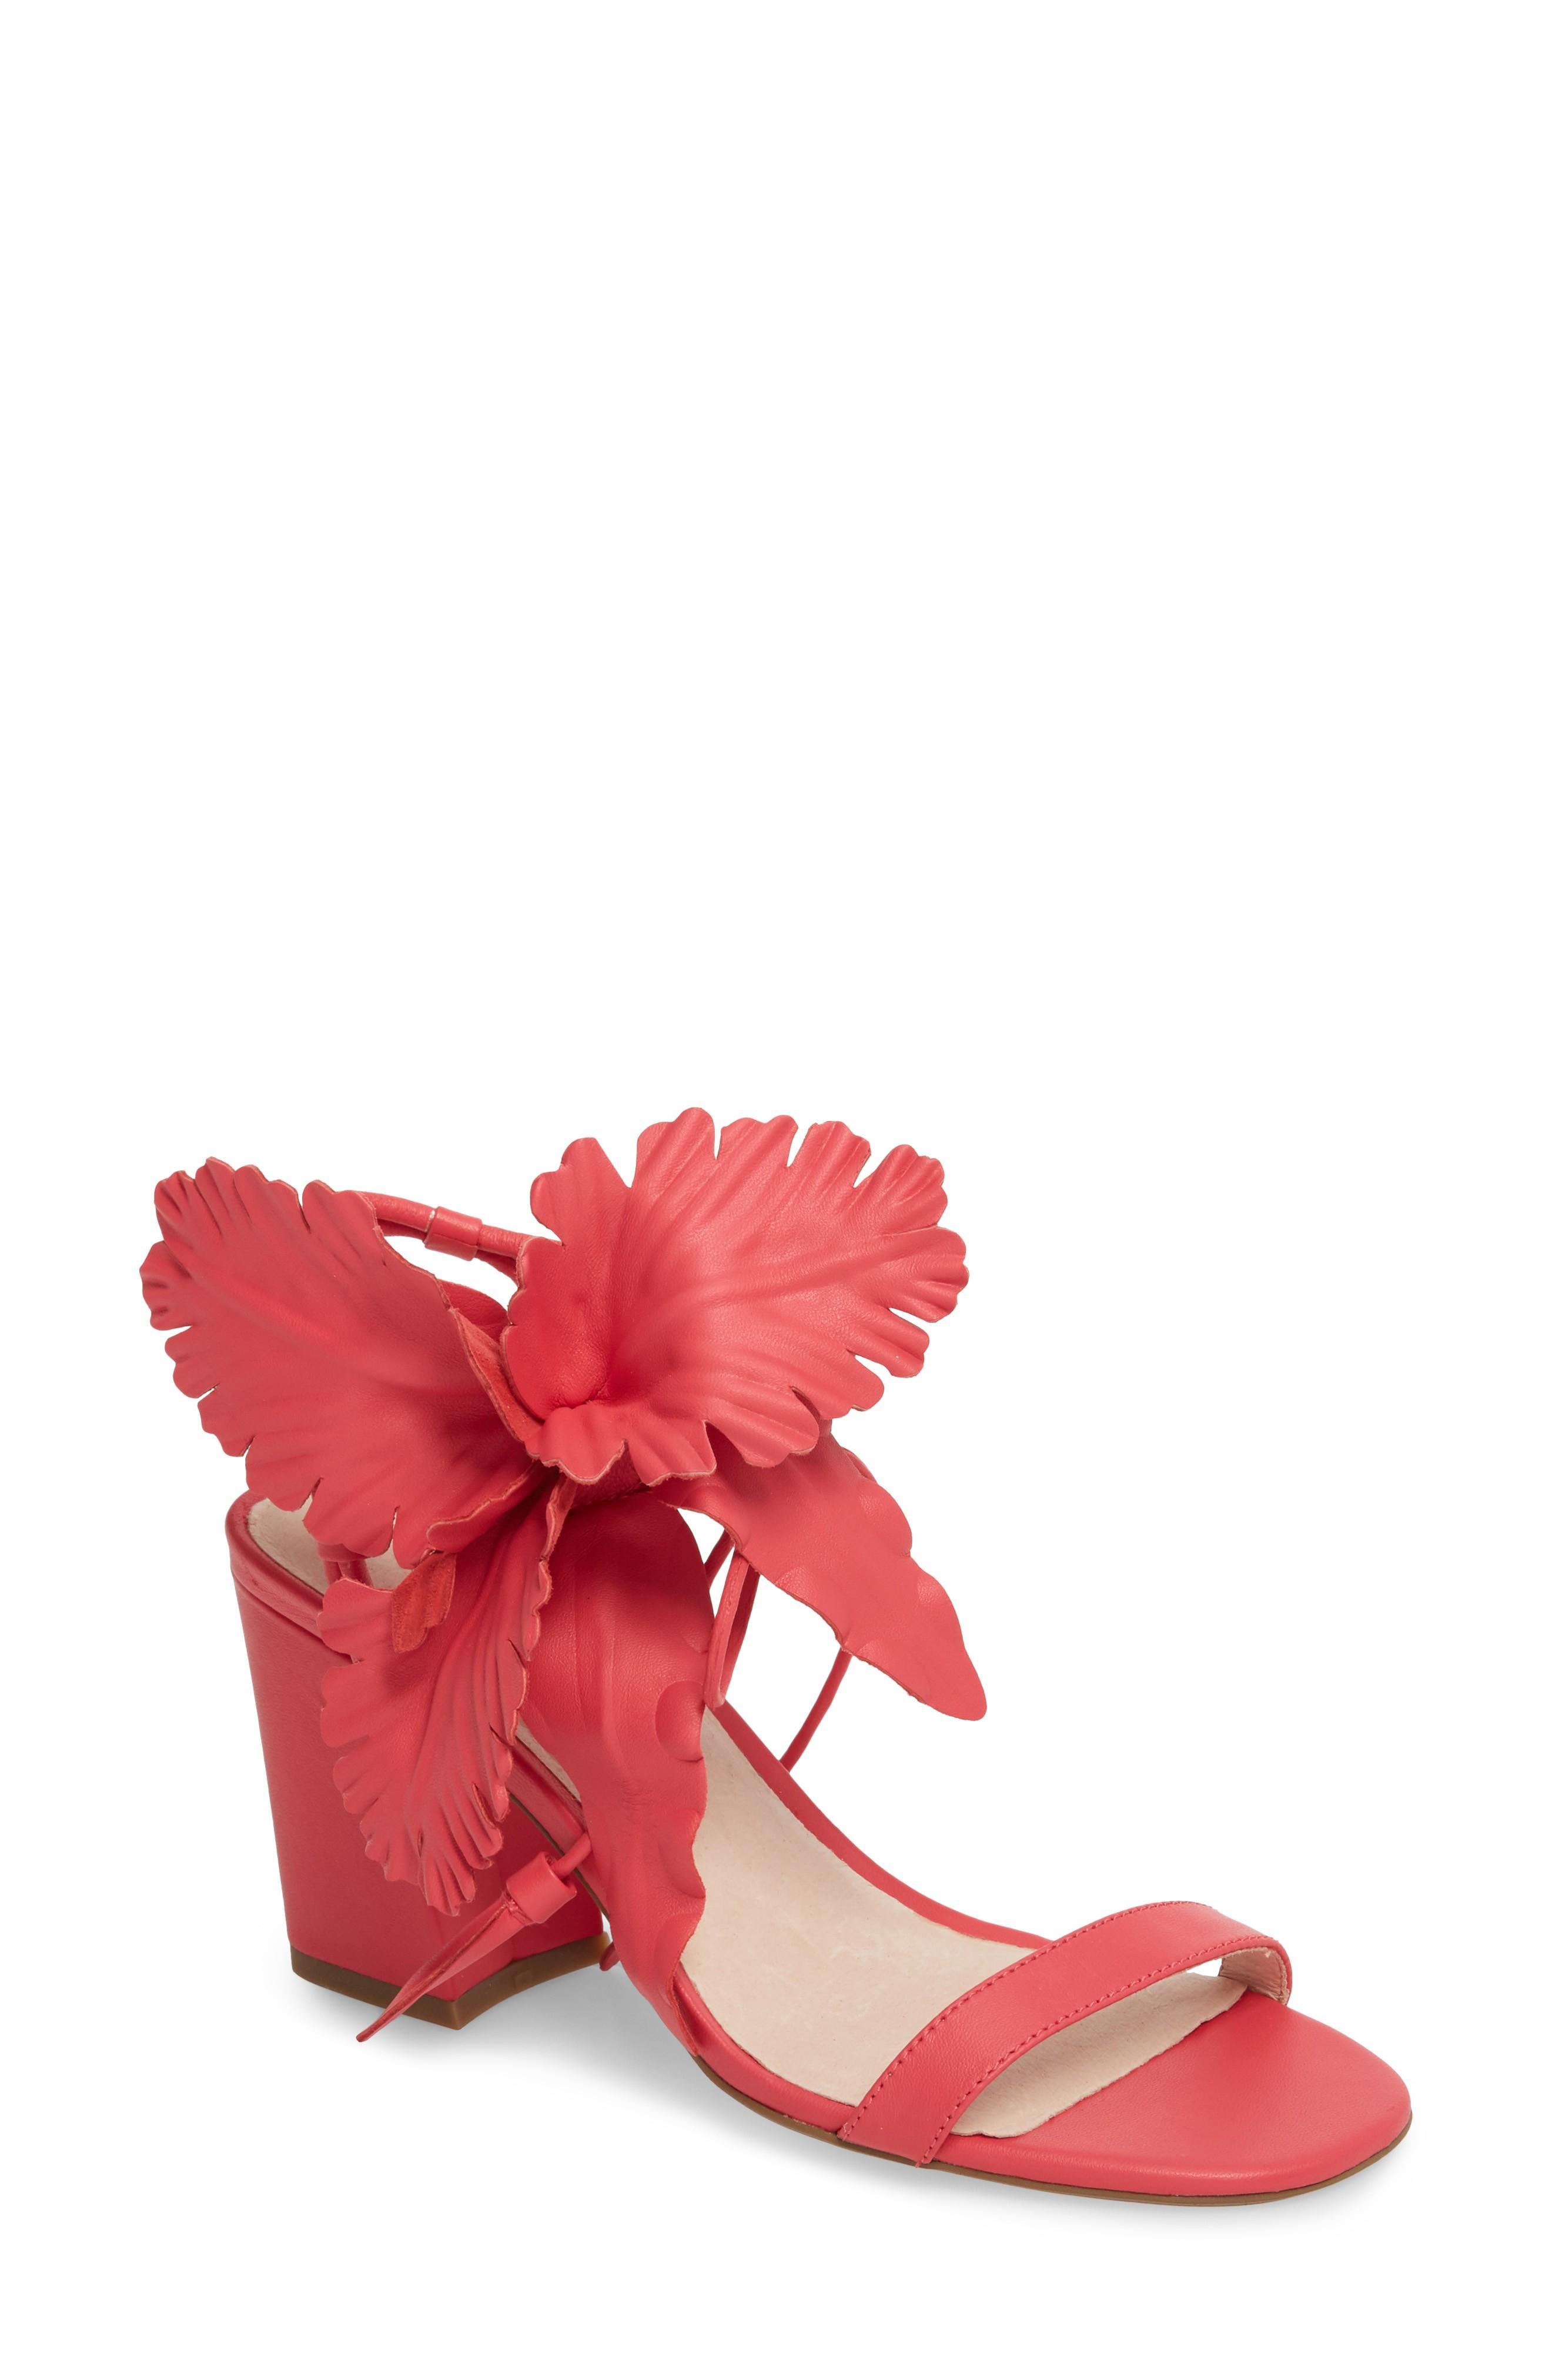 de3ad1474470 Cecelia New York Hibiscus Sandal In Fuchsia Leather